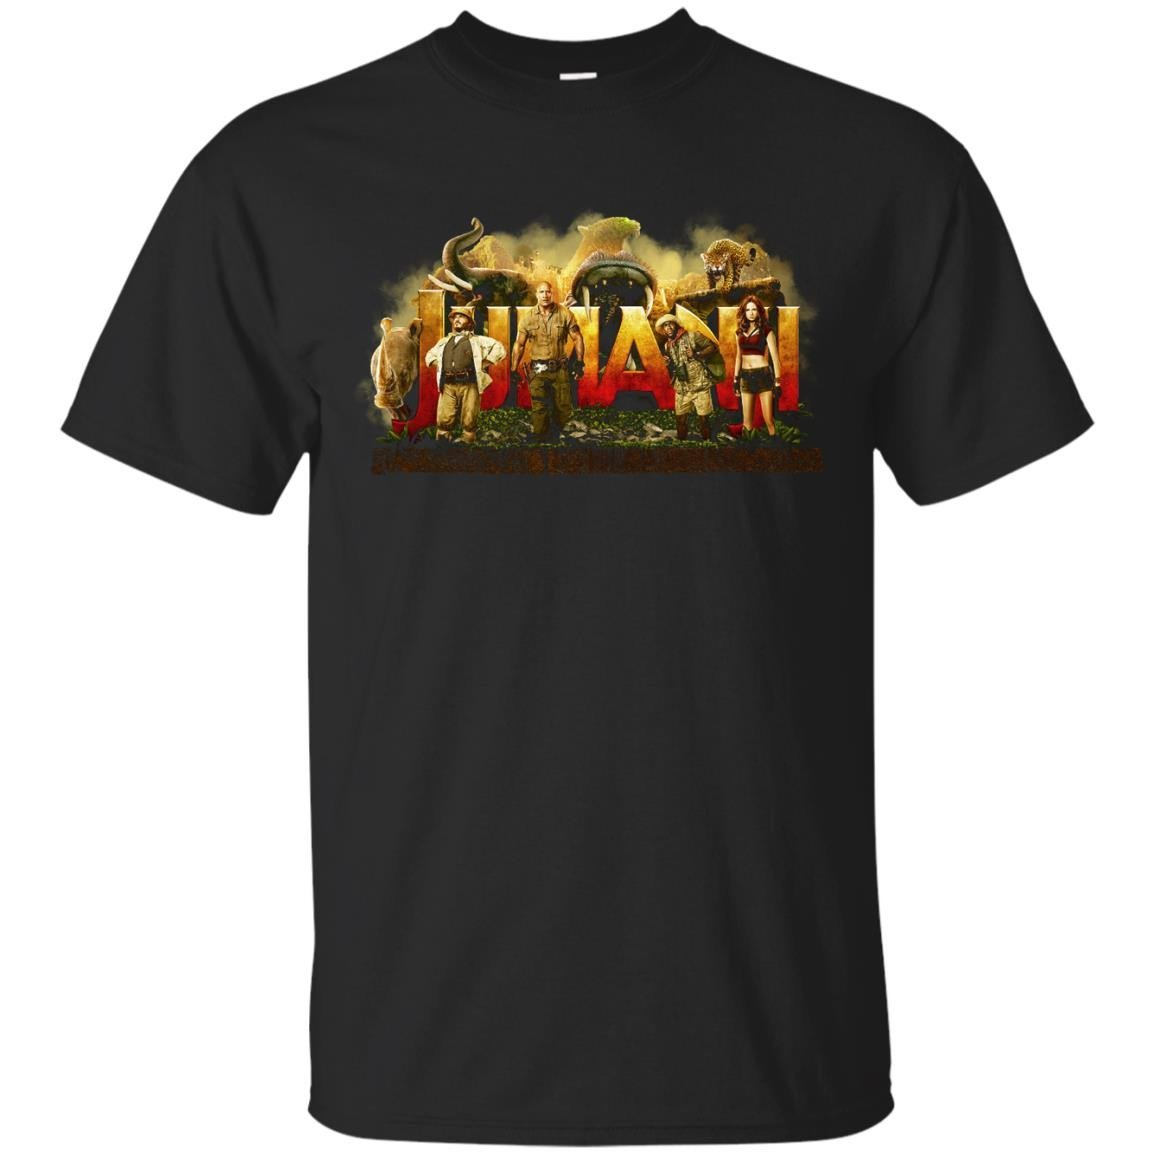 Jumanji Welcome To The Jungle T Shirt